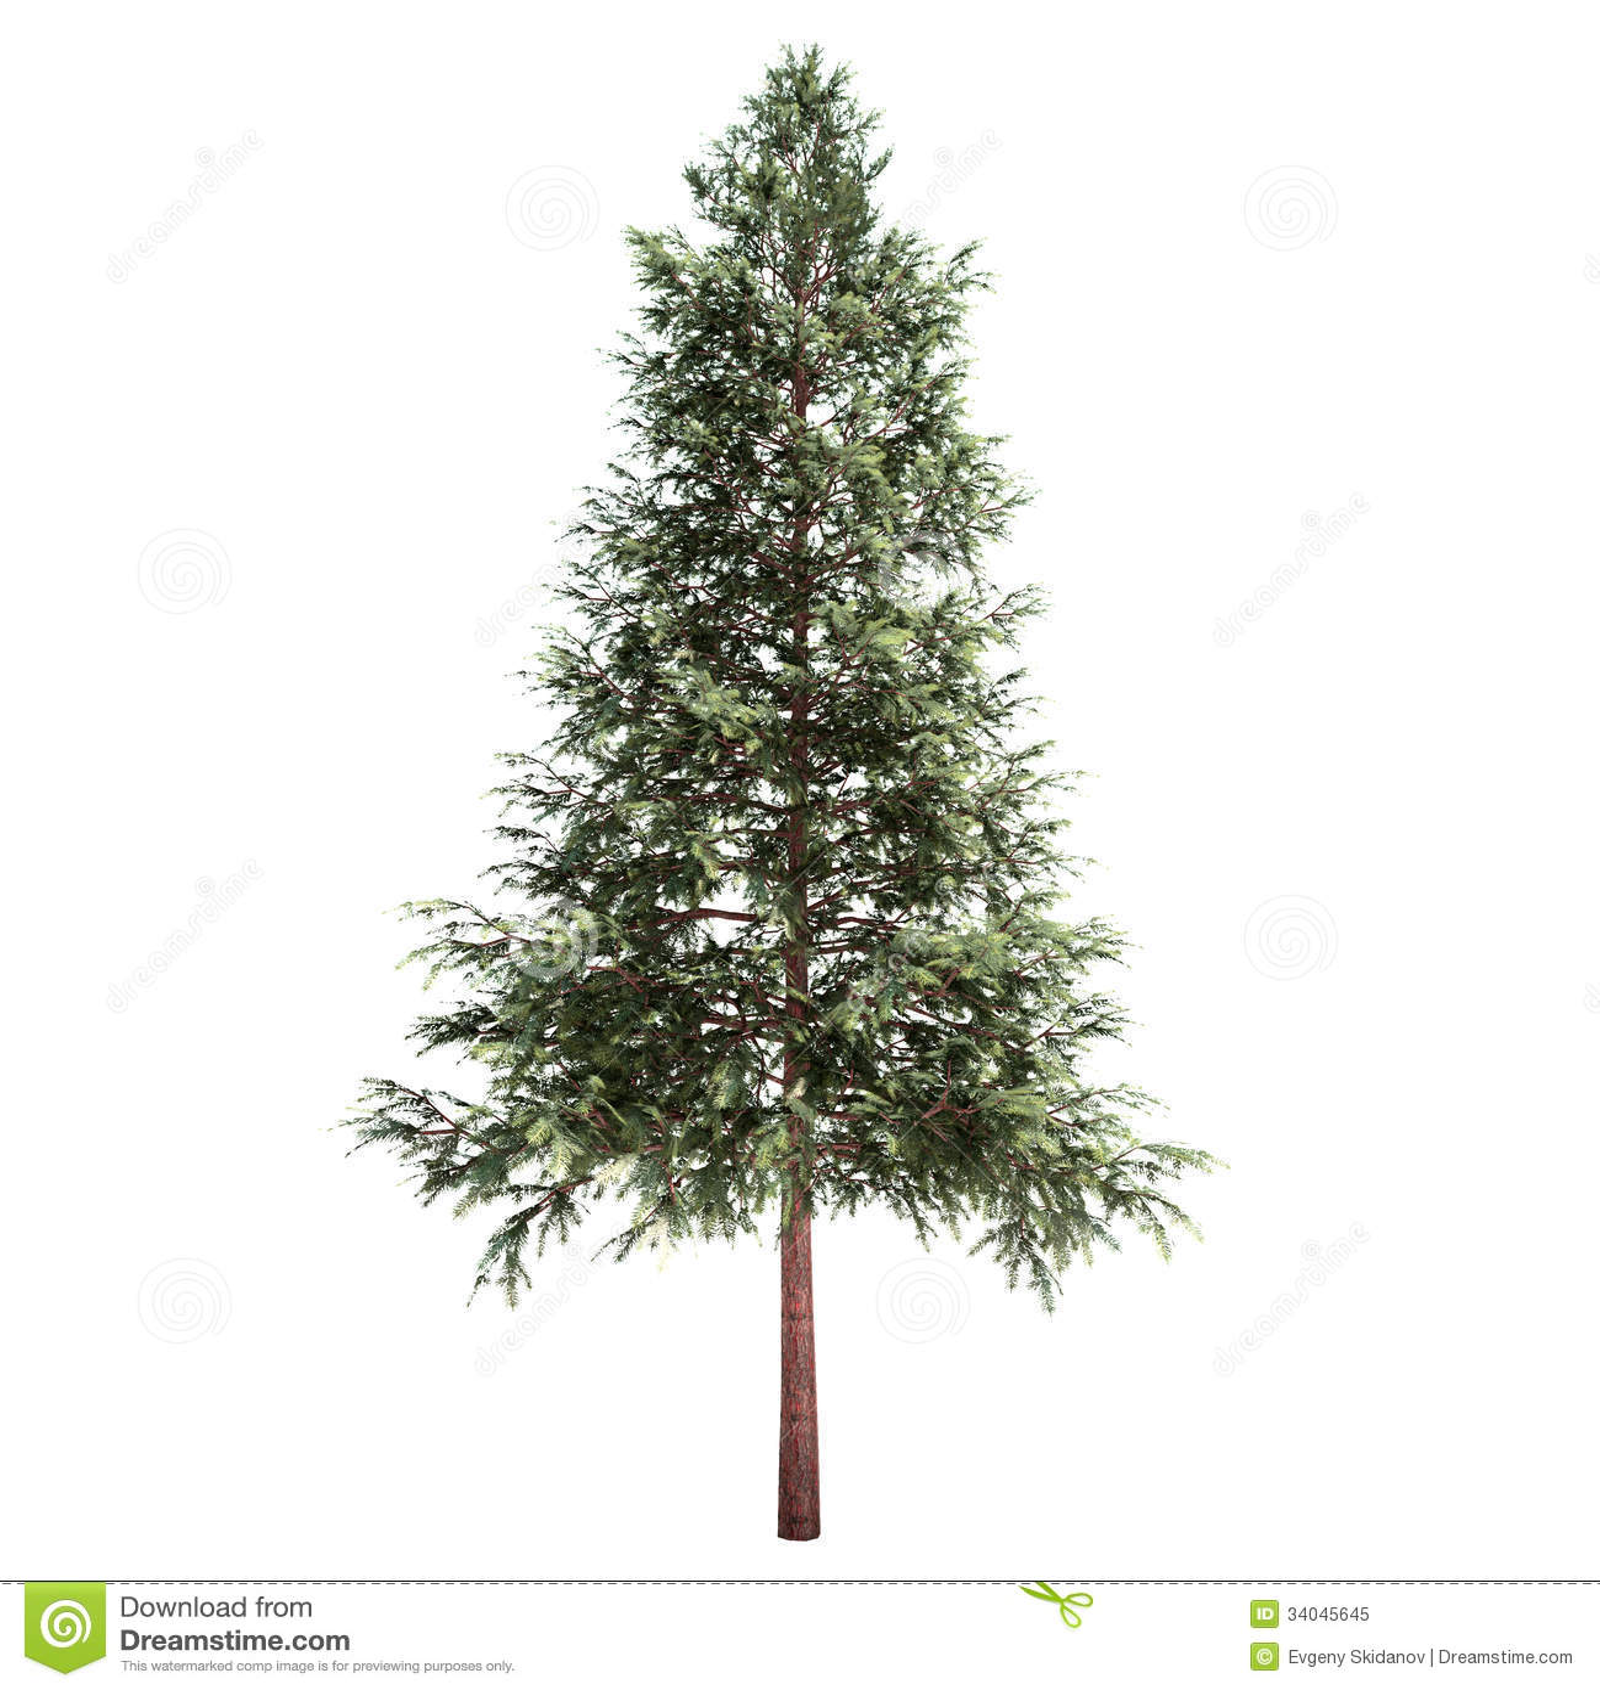 Norway Spruce Tree Isolated Royalty Free Stock Photo - Image: 34045645